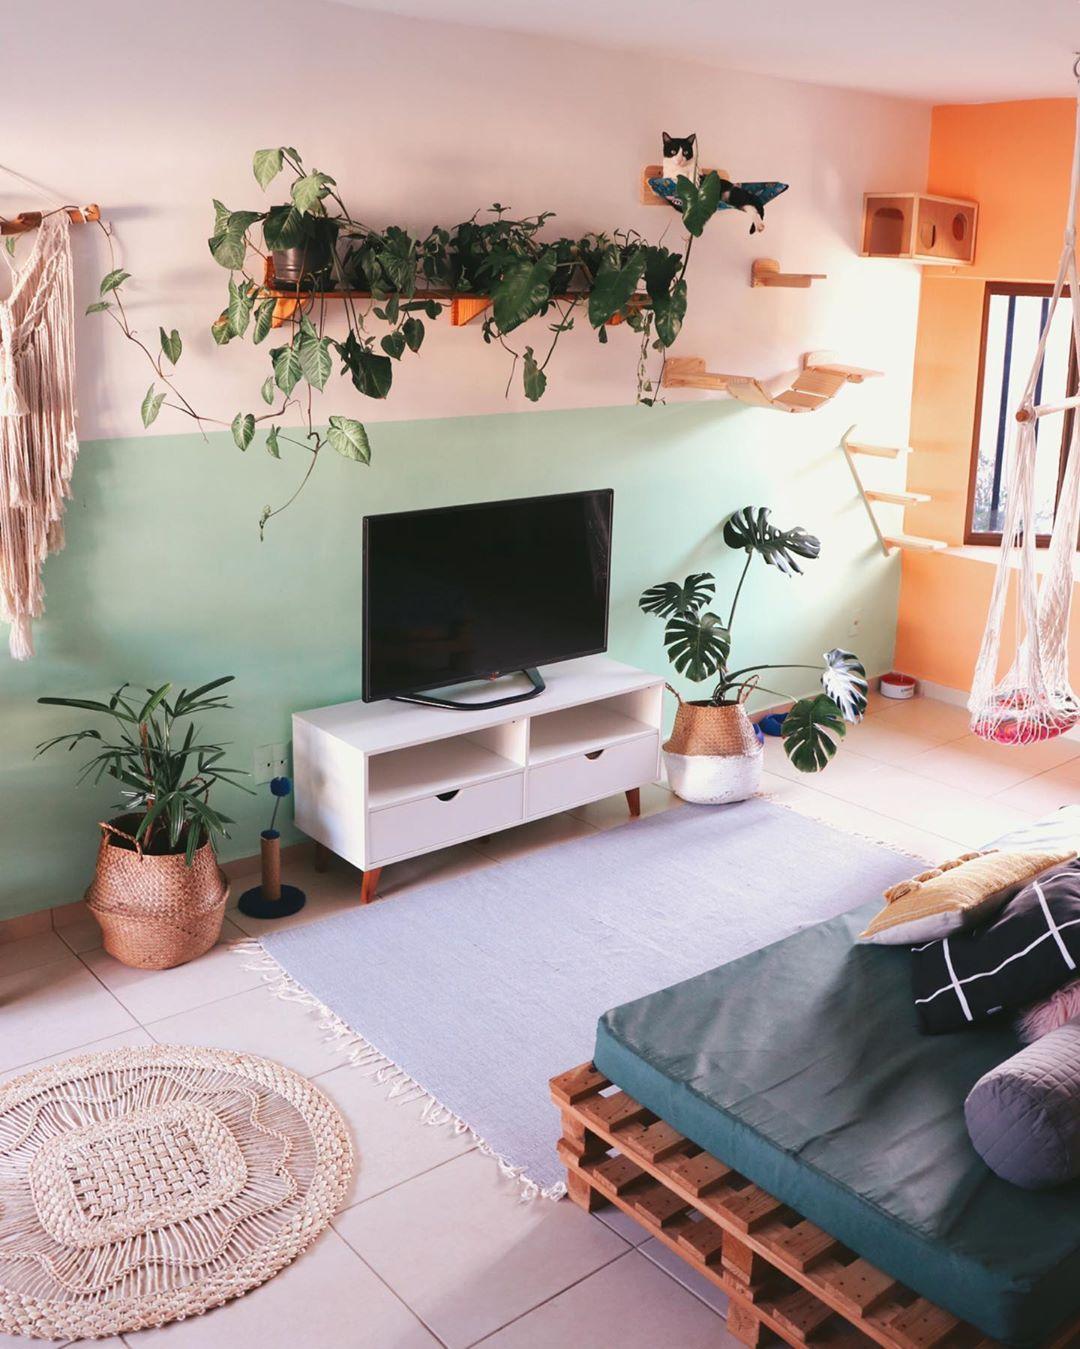 "CASA 14 INSPIRA on Instagram: ""😌😌       #casacomplantas #urbanjungle #urbanjunglebr #urbanjungleblog #interiorstyling #decorsala #decorsaladeestar"""